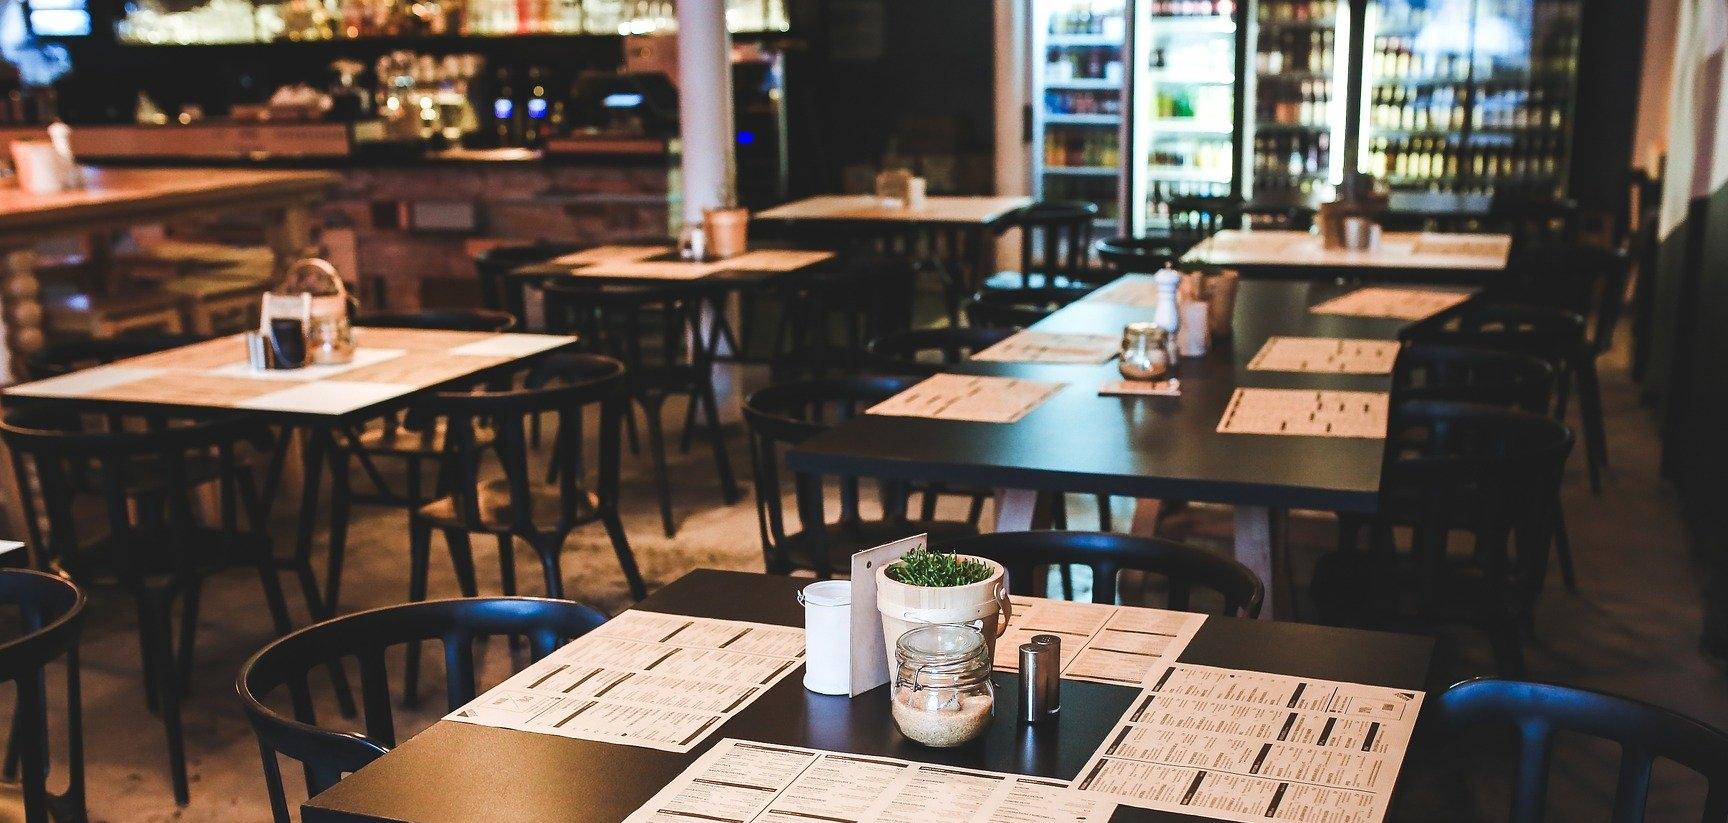 Empty restaurant symbolic of COVID-19 pandemic